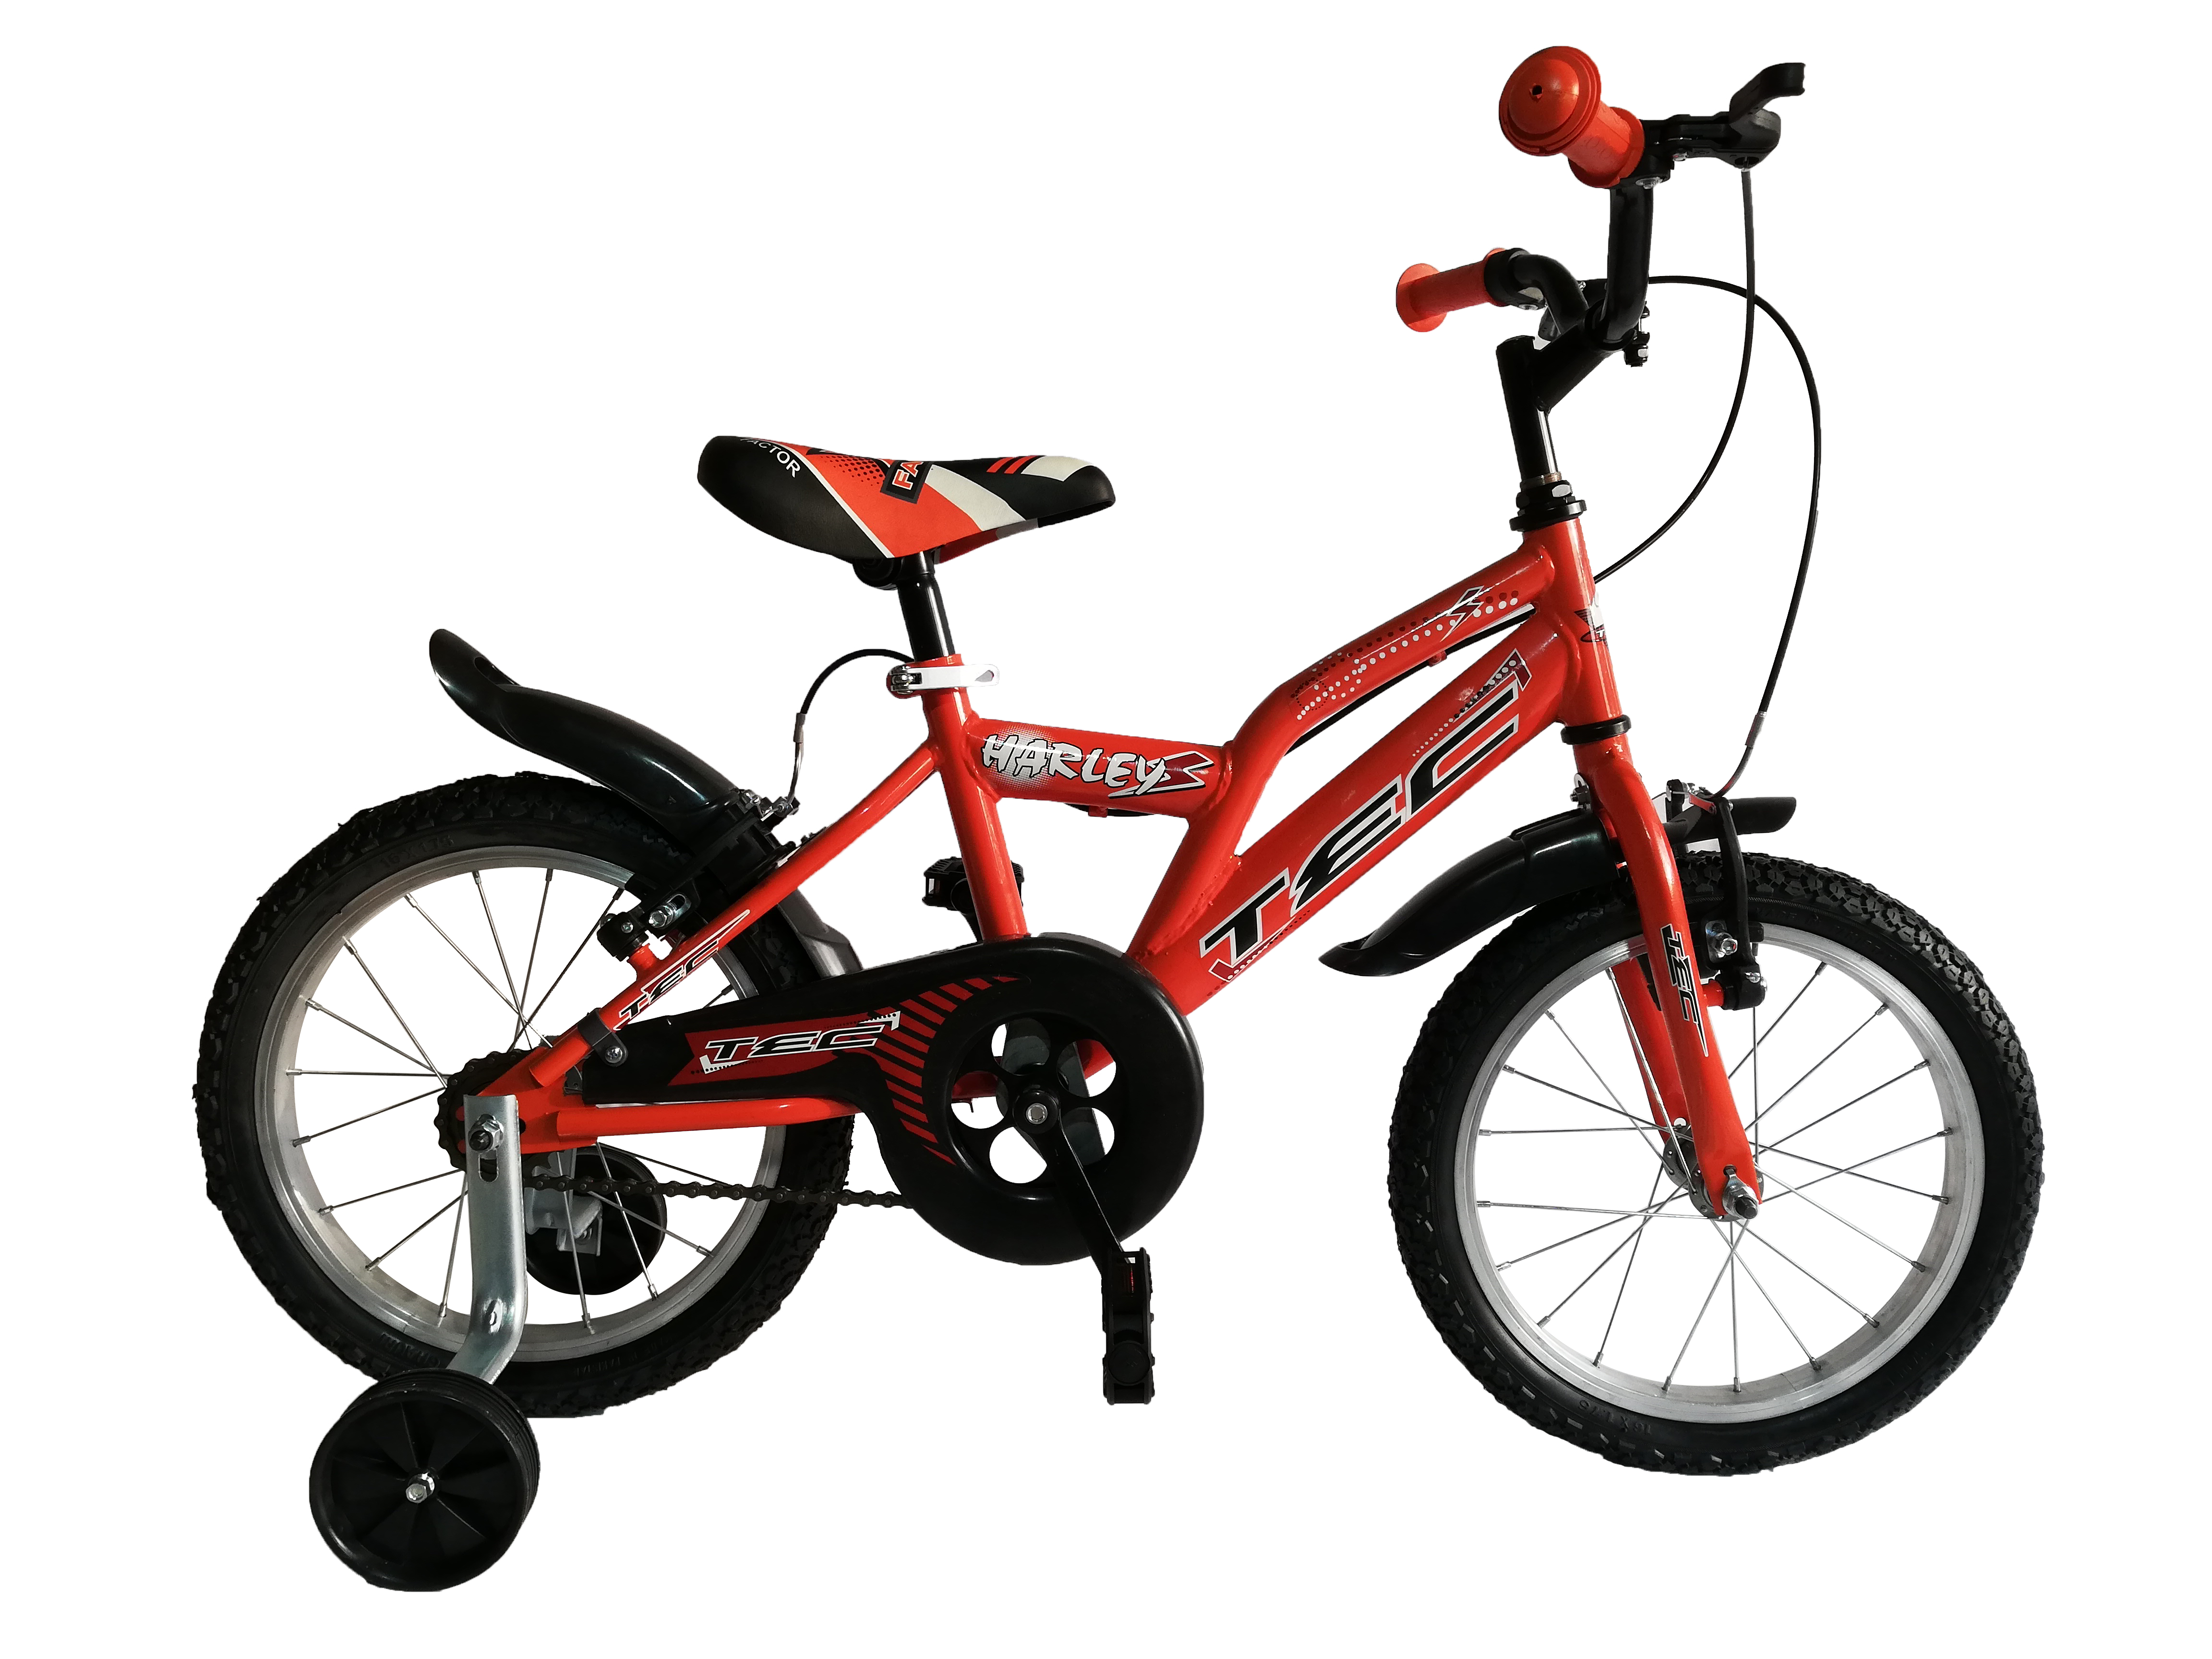 "Bicicleta Copii TEC Harley Culoare Galben Roata 16"" Otel [0]"